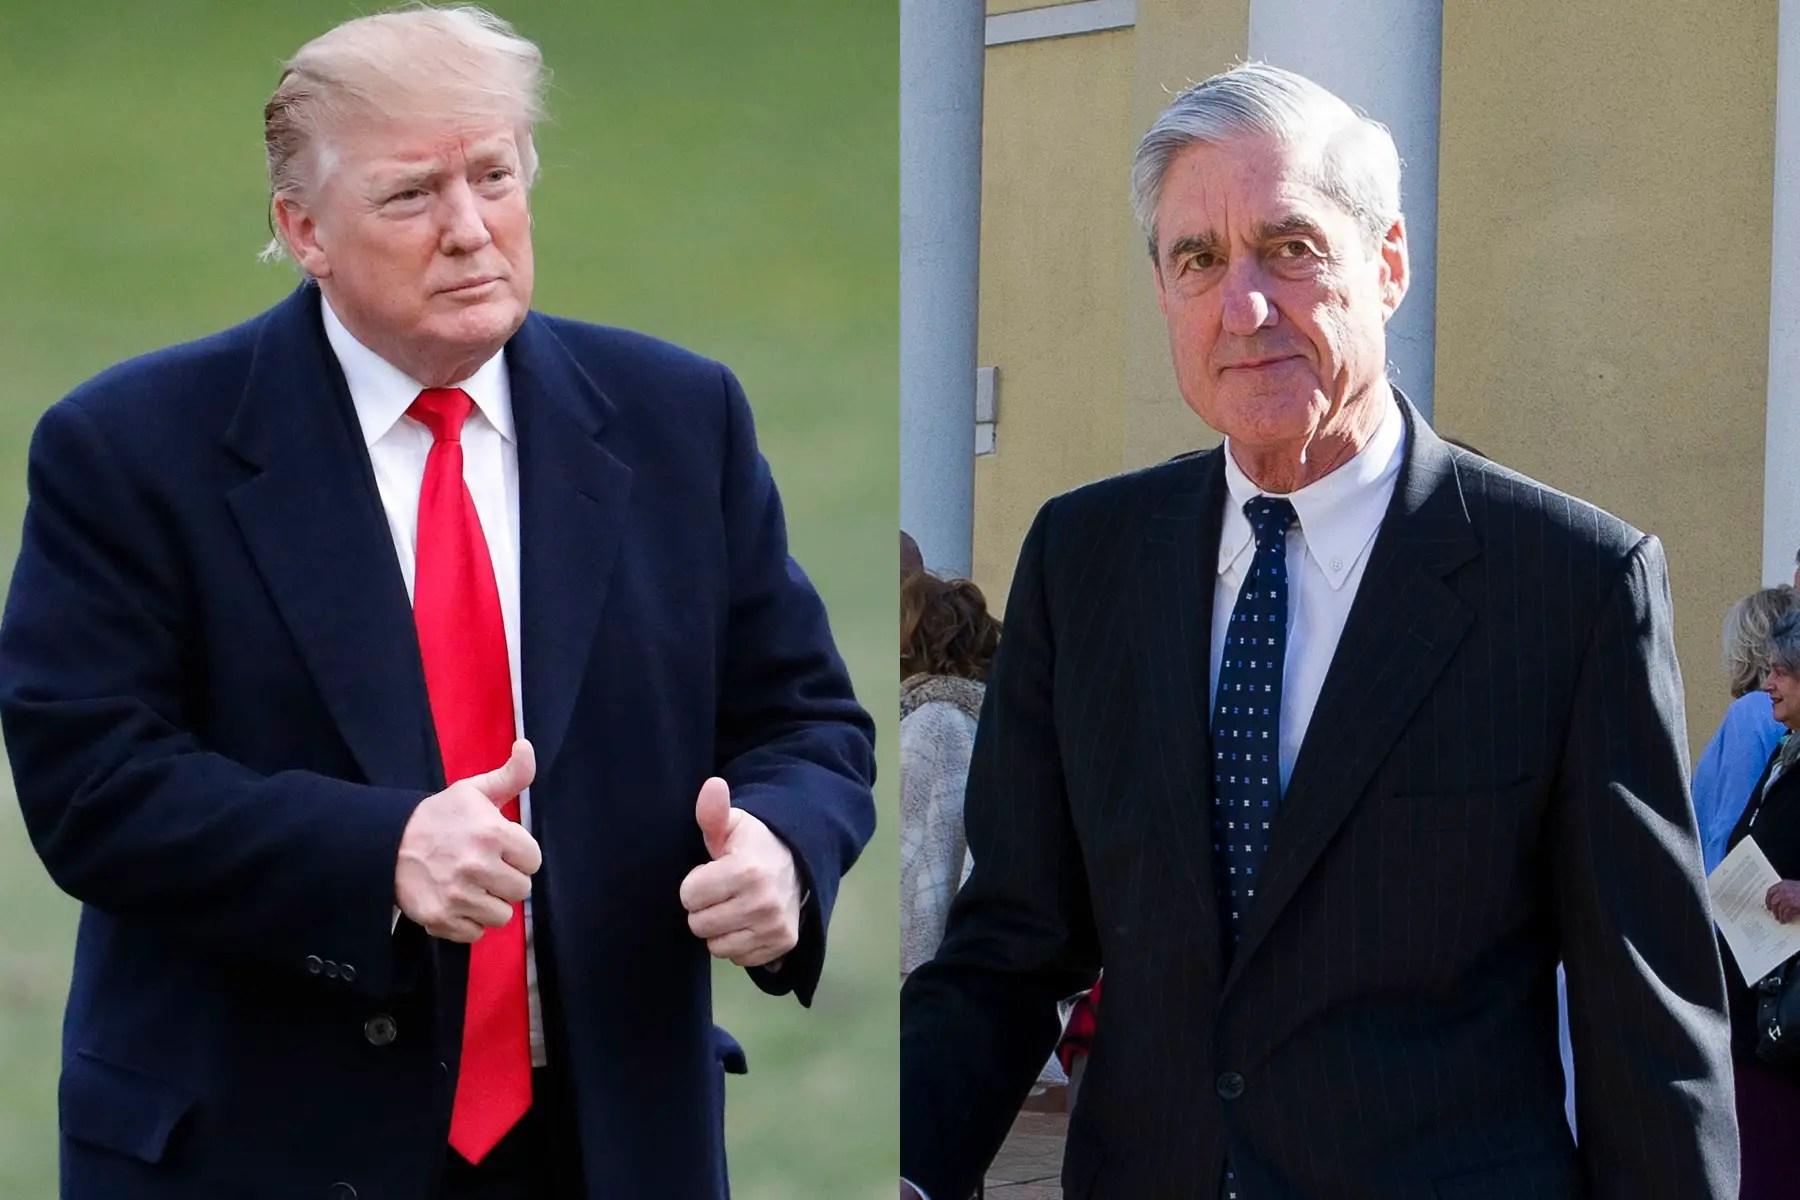 Trump Mueller 2020 Campaign